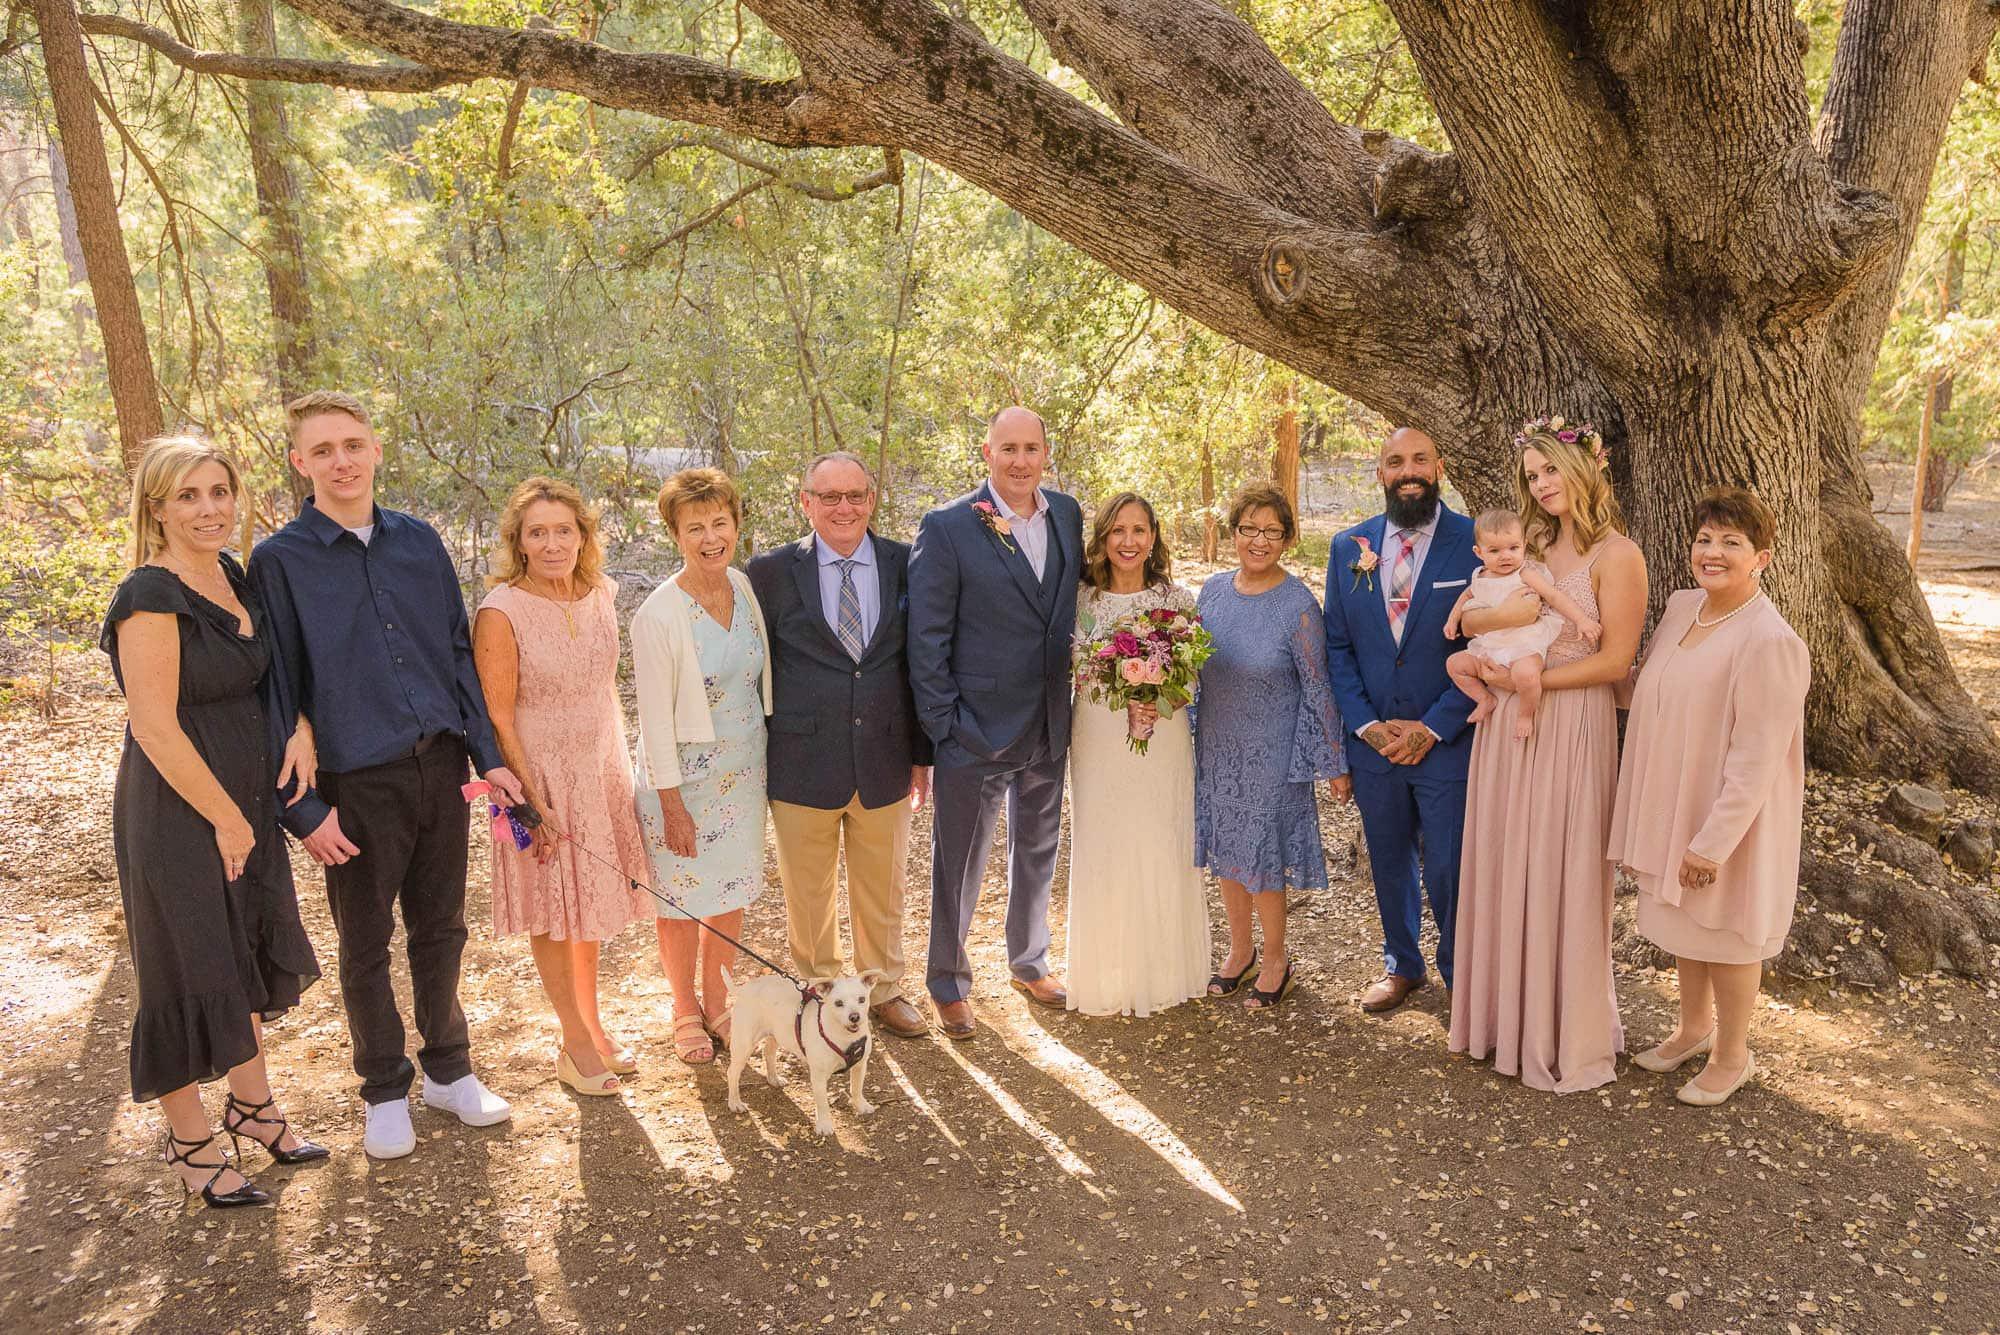 025_Alan_and_Heidi_Wedding_Jackie_Dannon